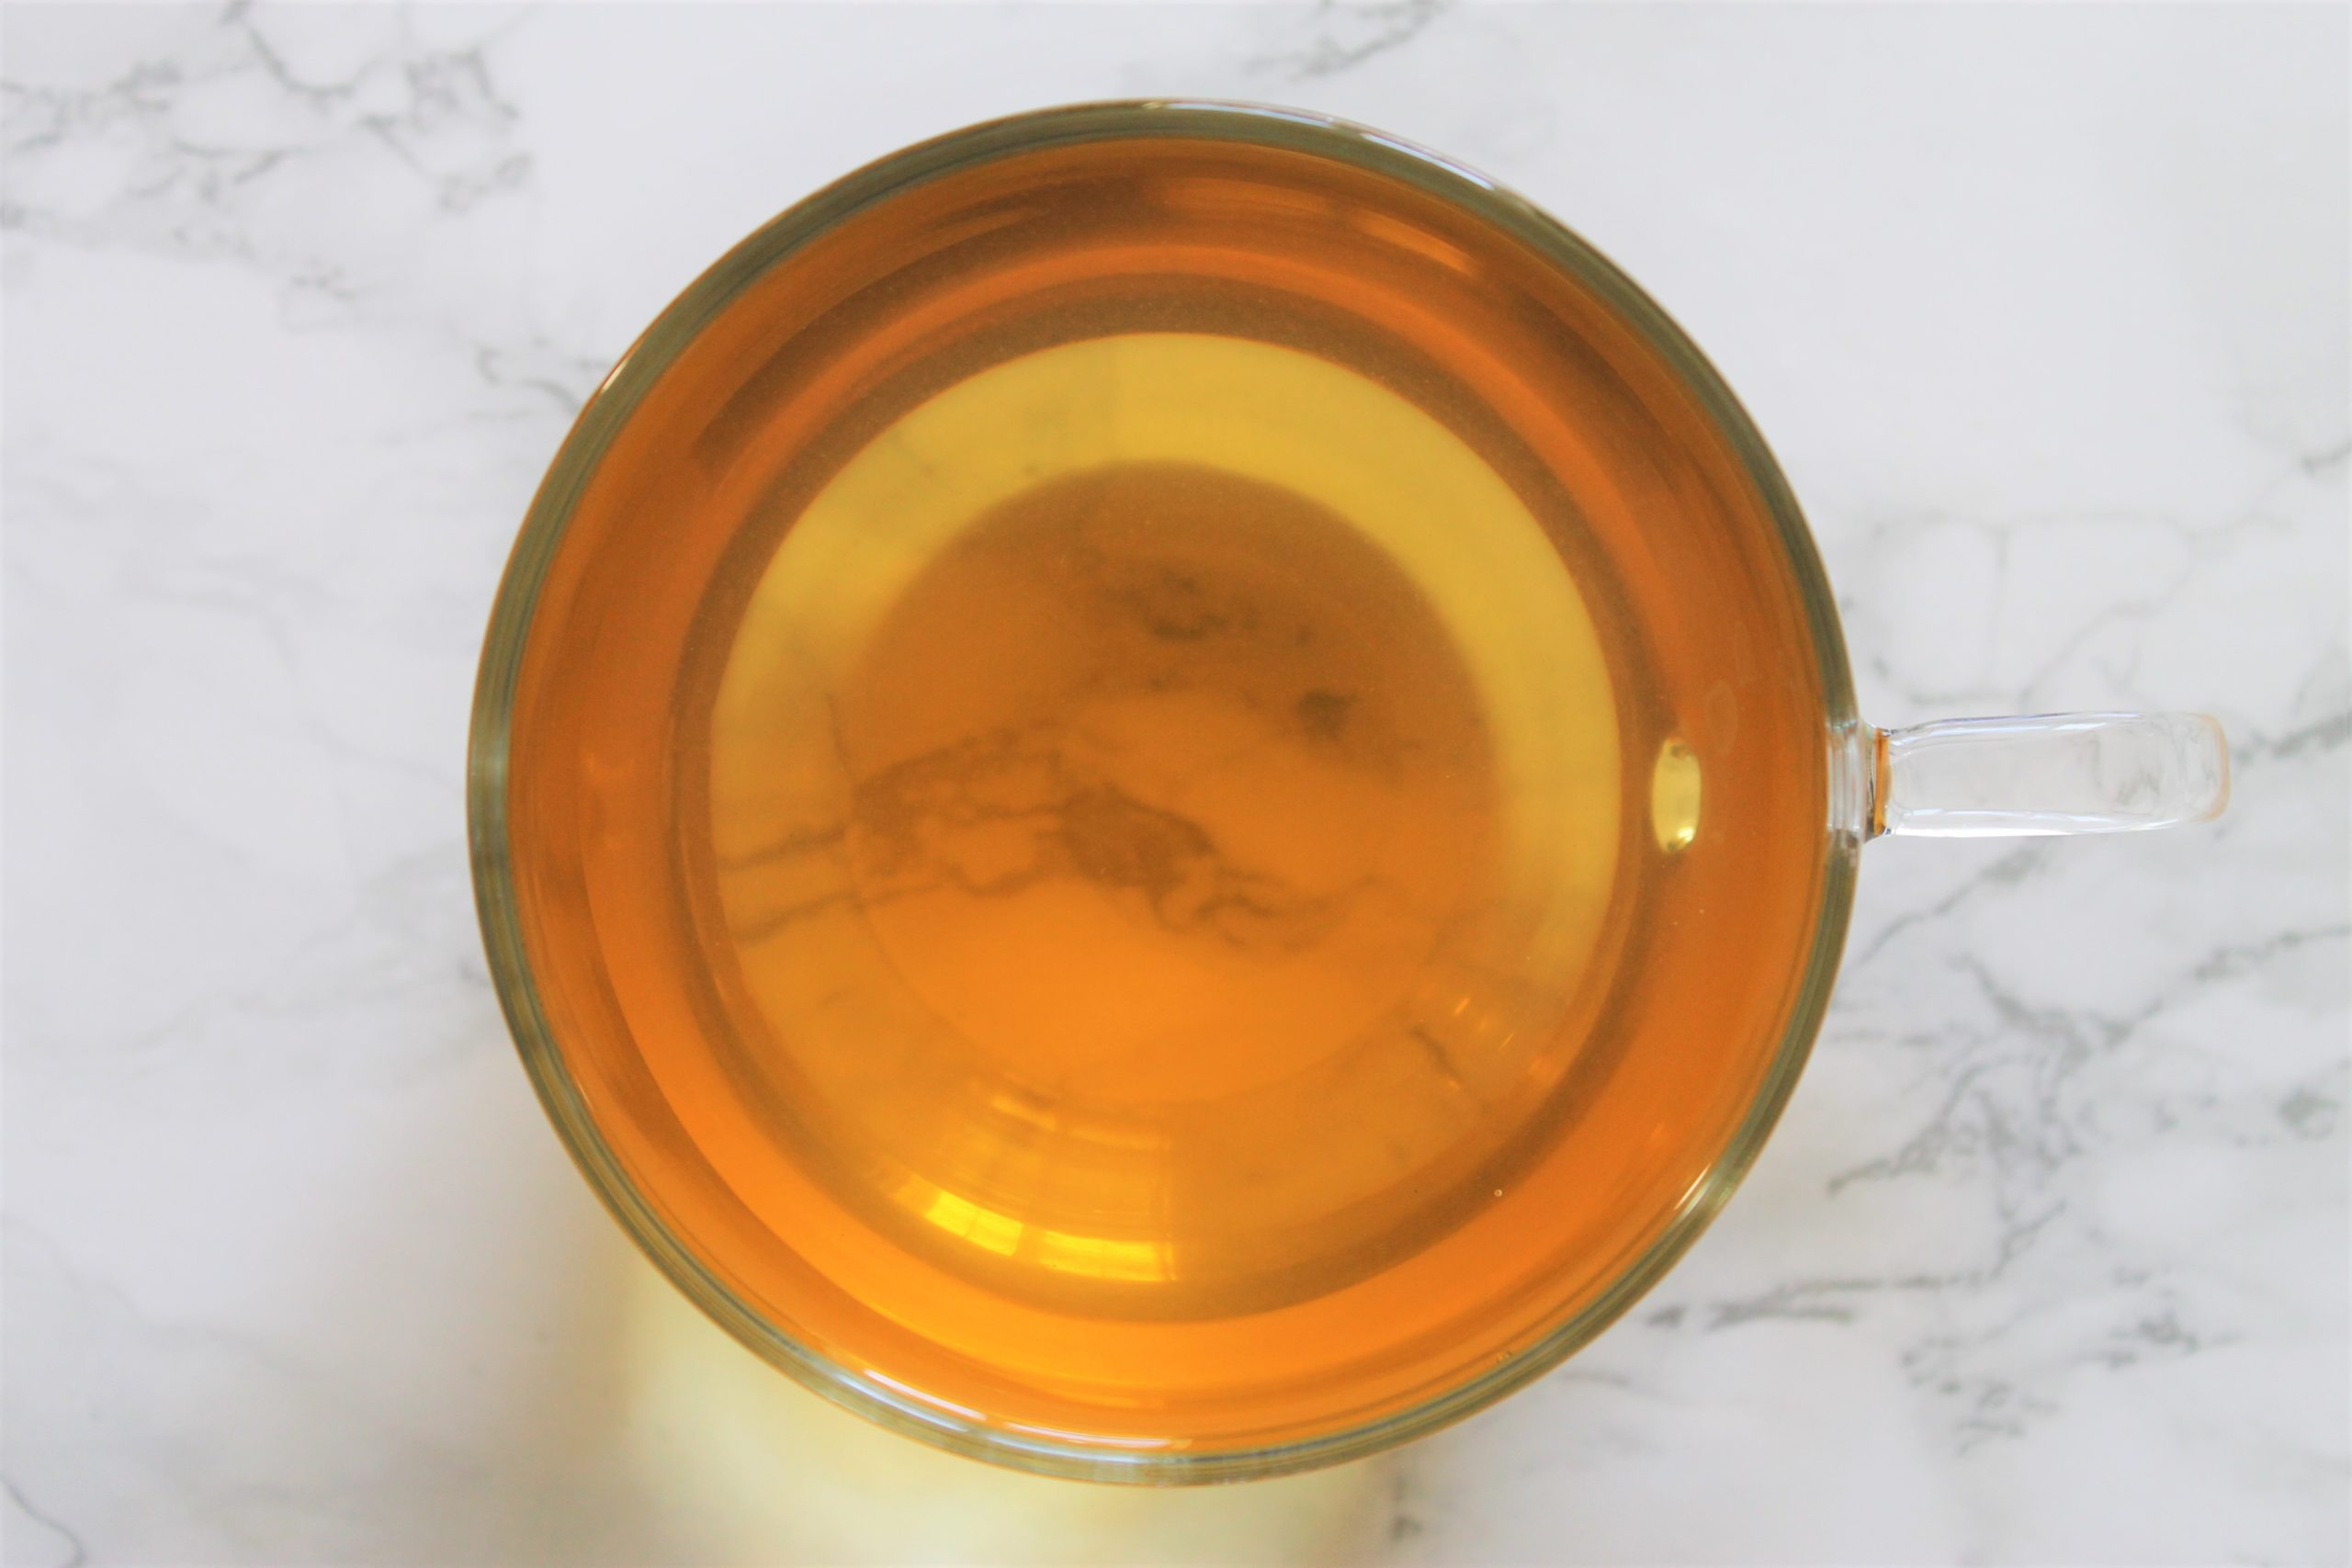 green tea in glass teacup